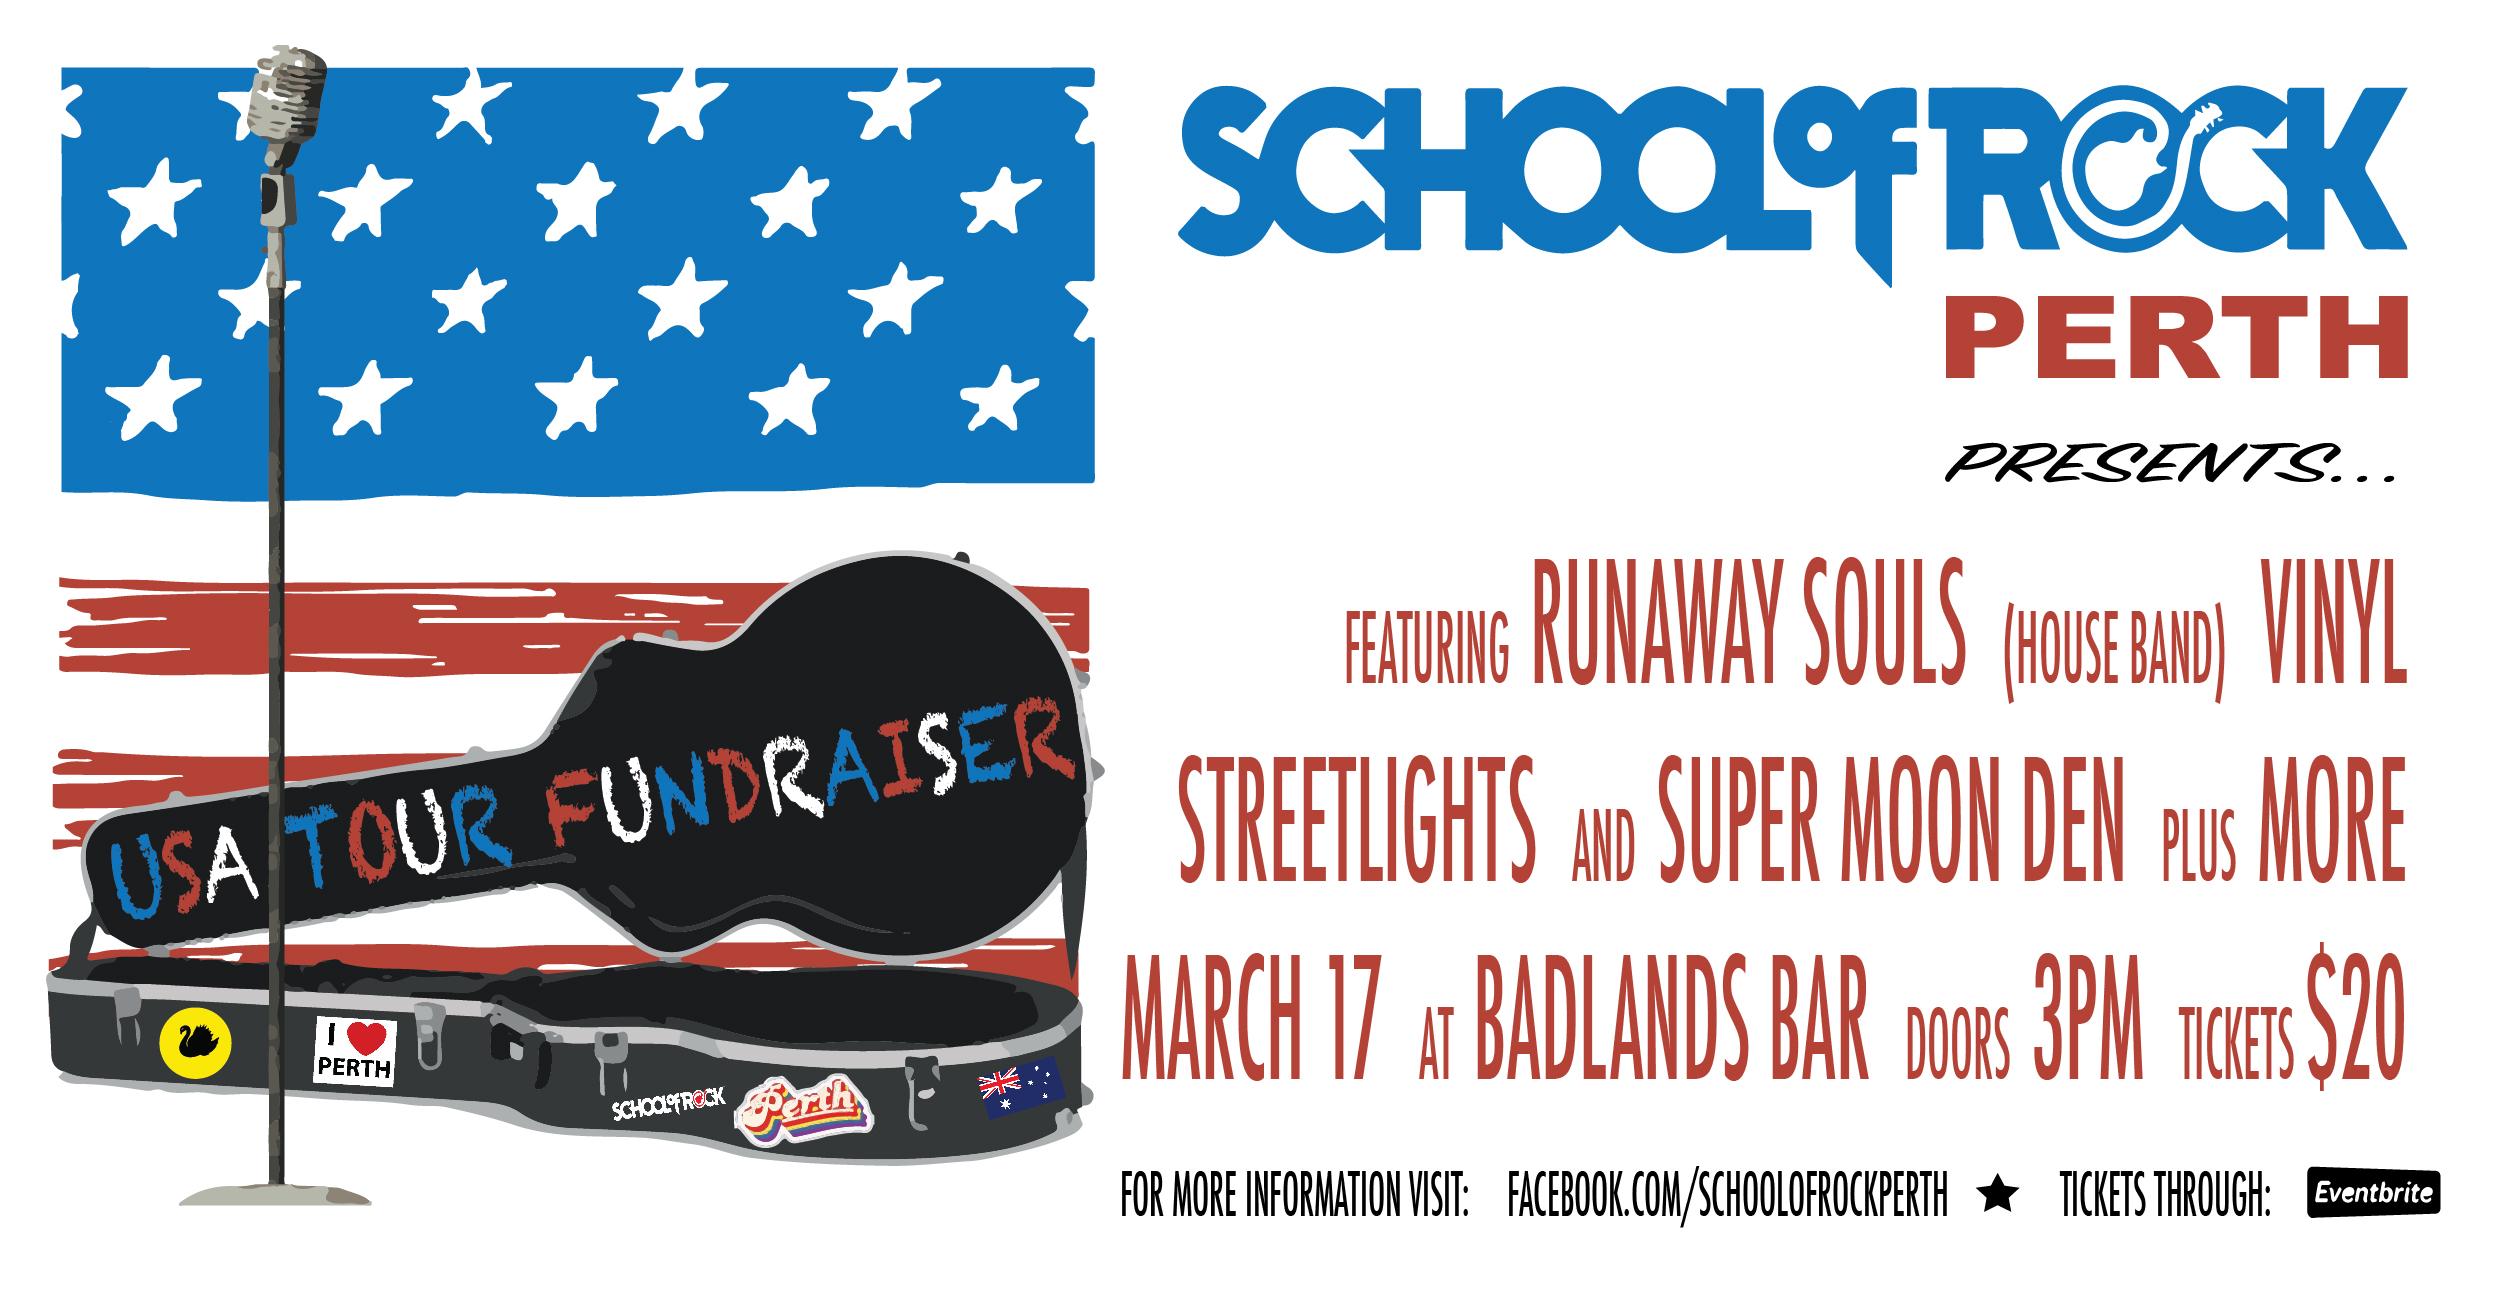 School of Rock Perth USA Tour Fundraiser